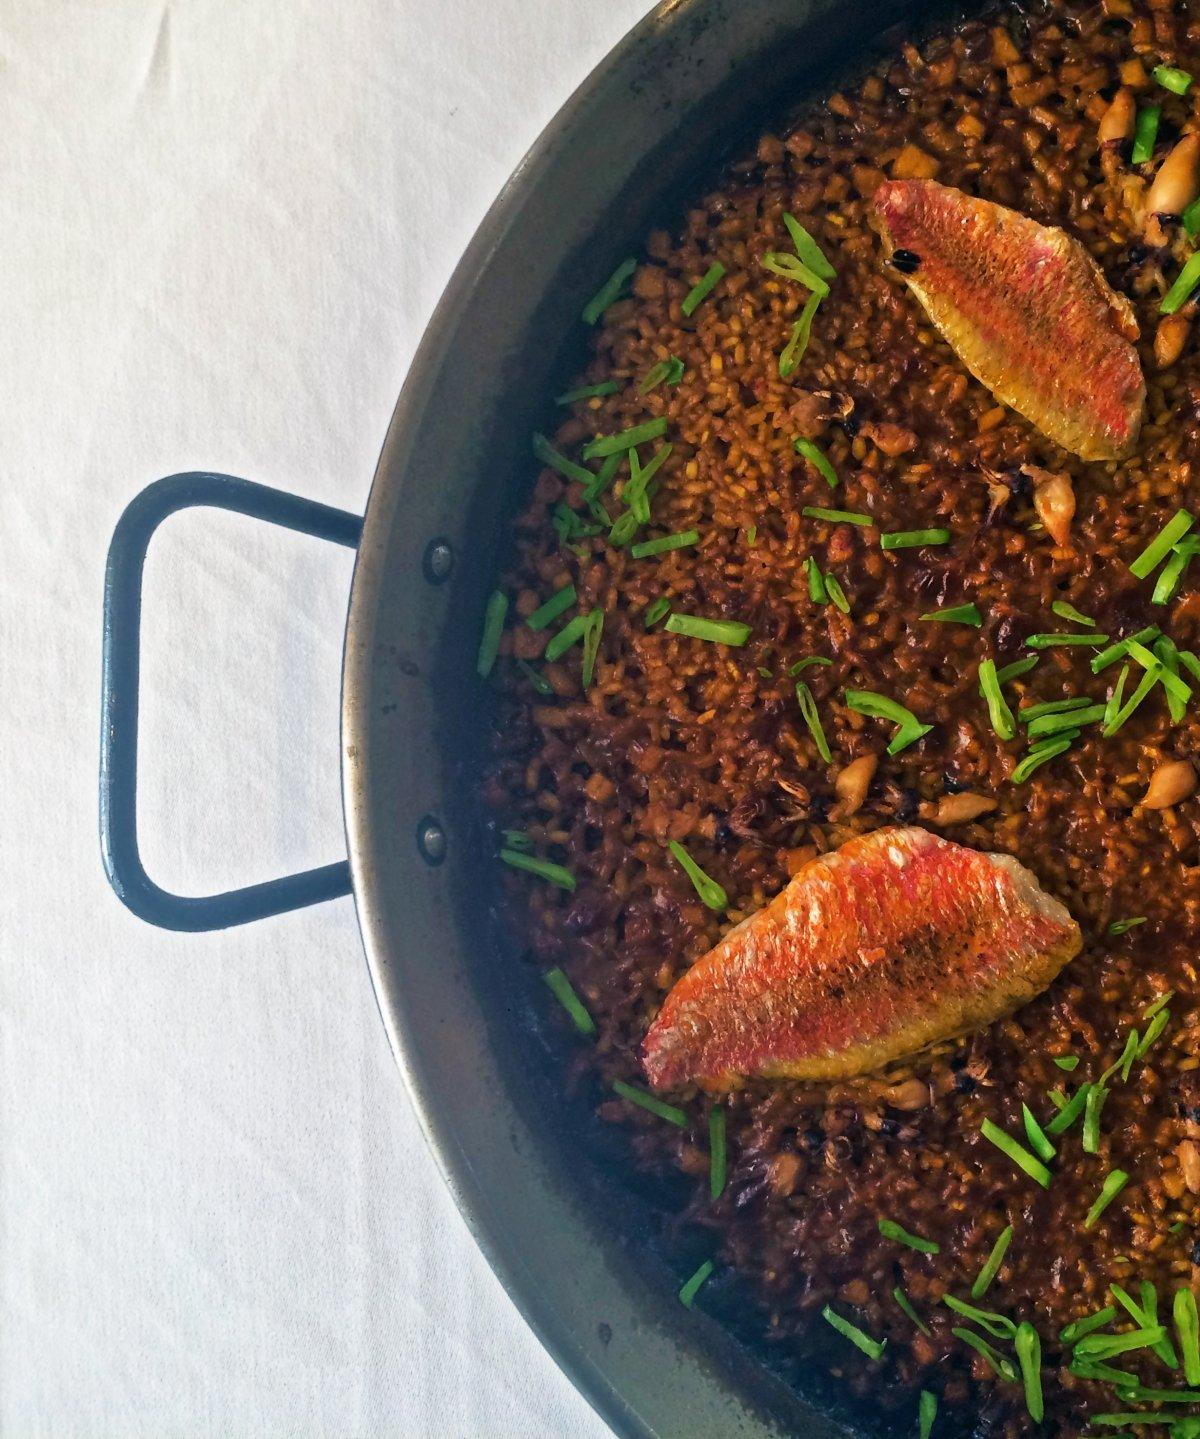 Arroz con salmonete del restaurante Agua de Mar